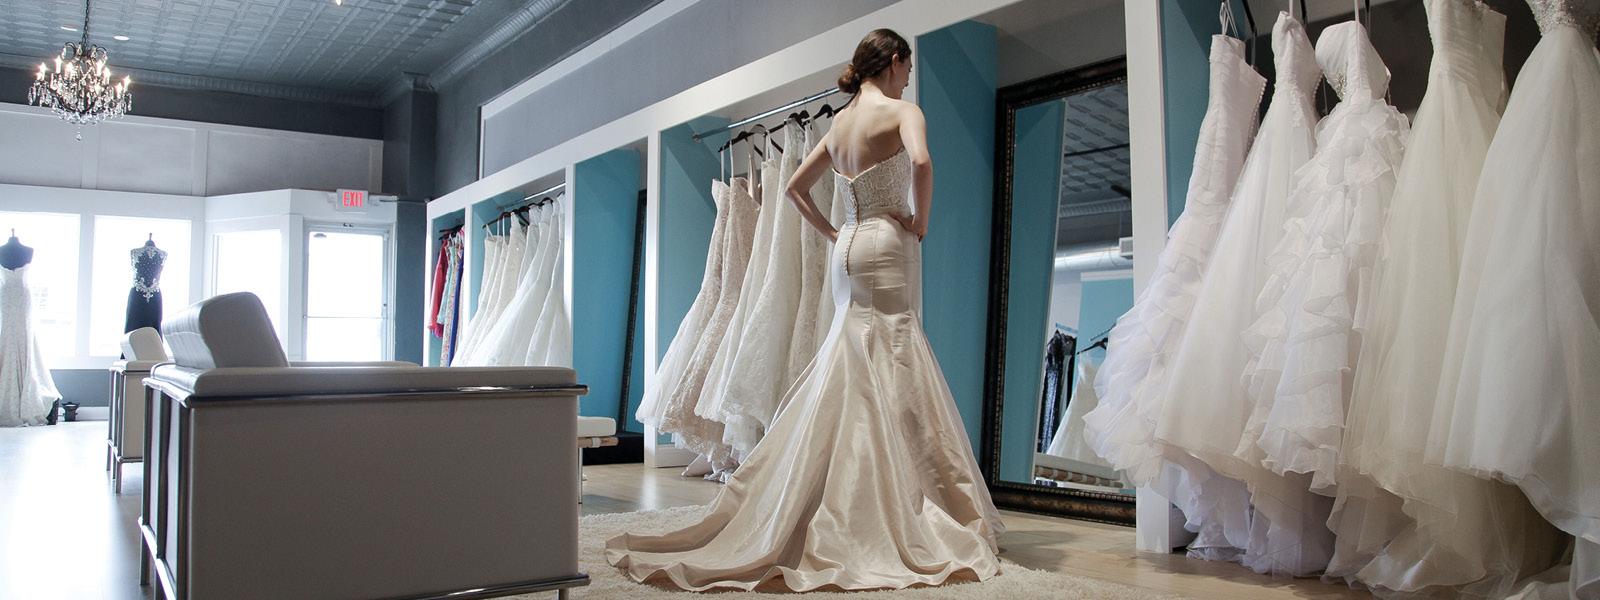 Bridal Boutique » San Angelo Wedding Dress & Bridal Shop